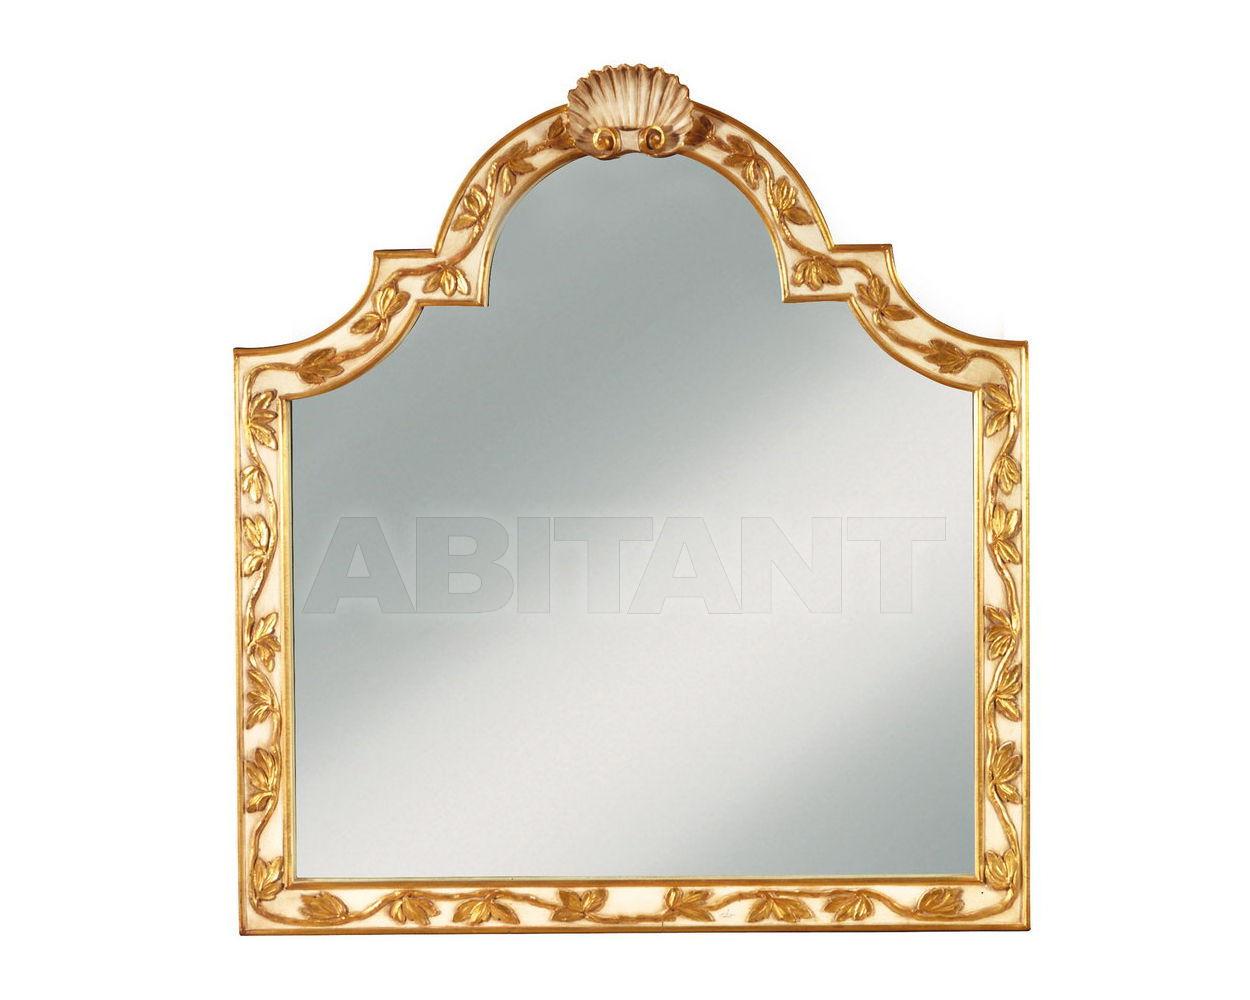 Купить Зеркало настенное Colombostile s.p.a. 2010 1652 SP